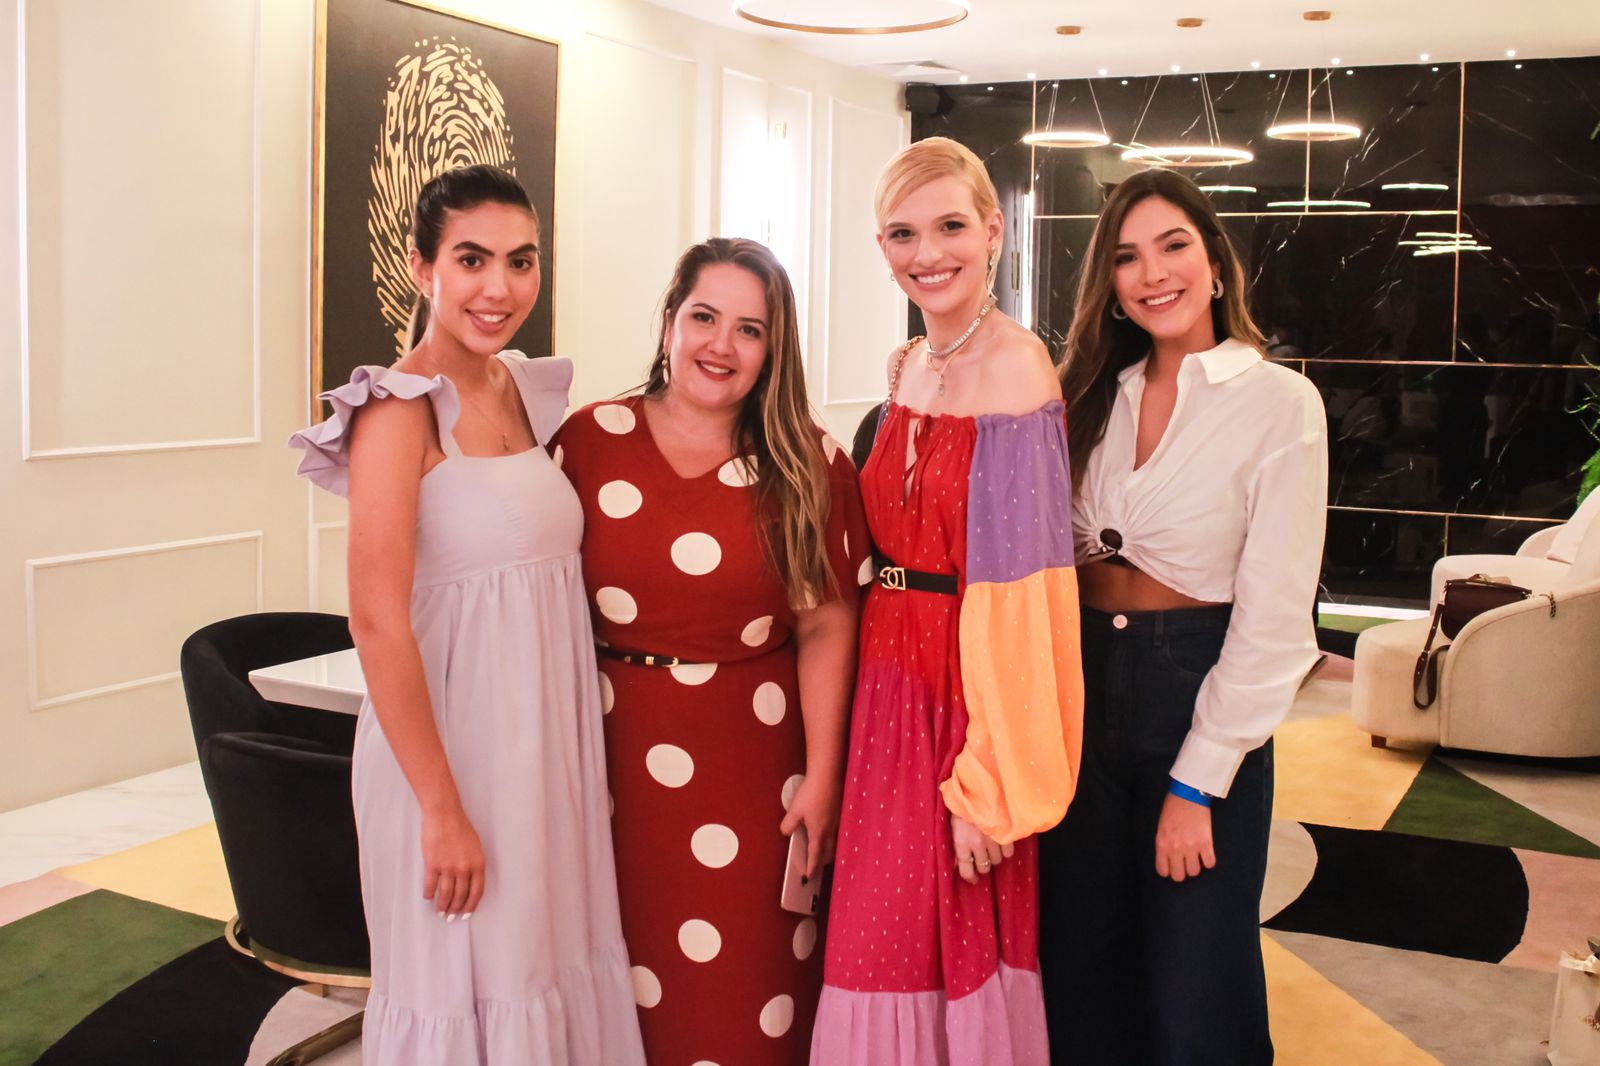 Ana Carolina Nafiff, Bianka Muniz, Bruna Maestrello e Juliana Teles